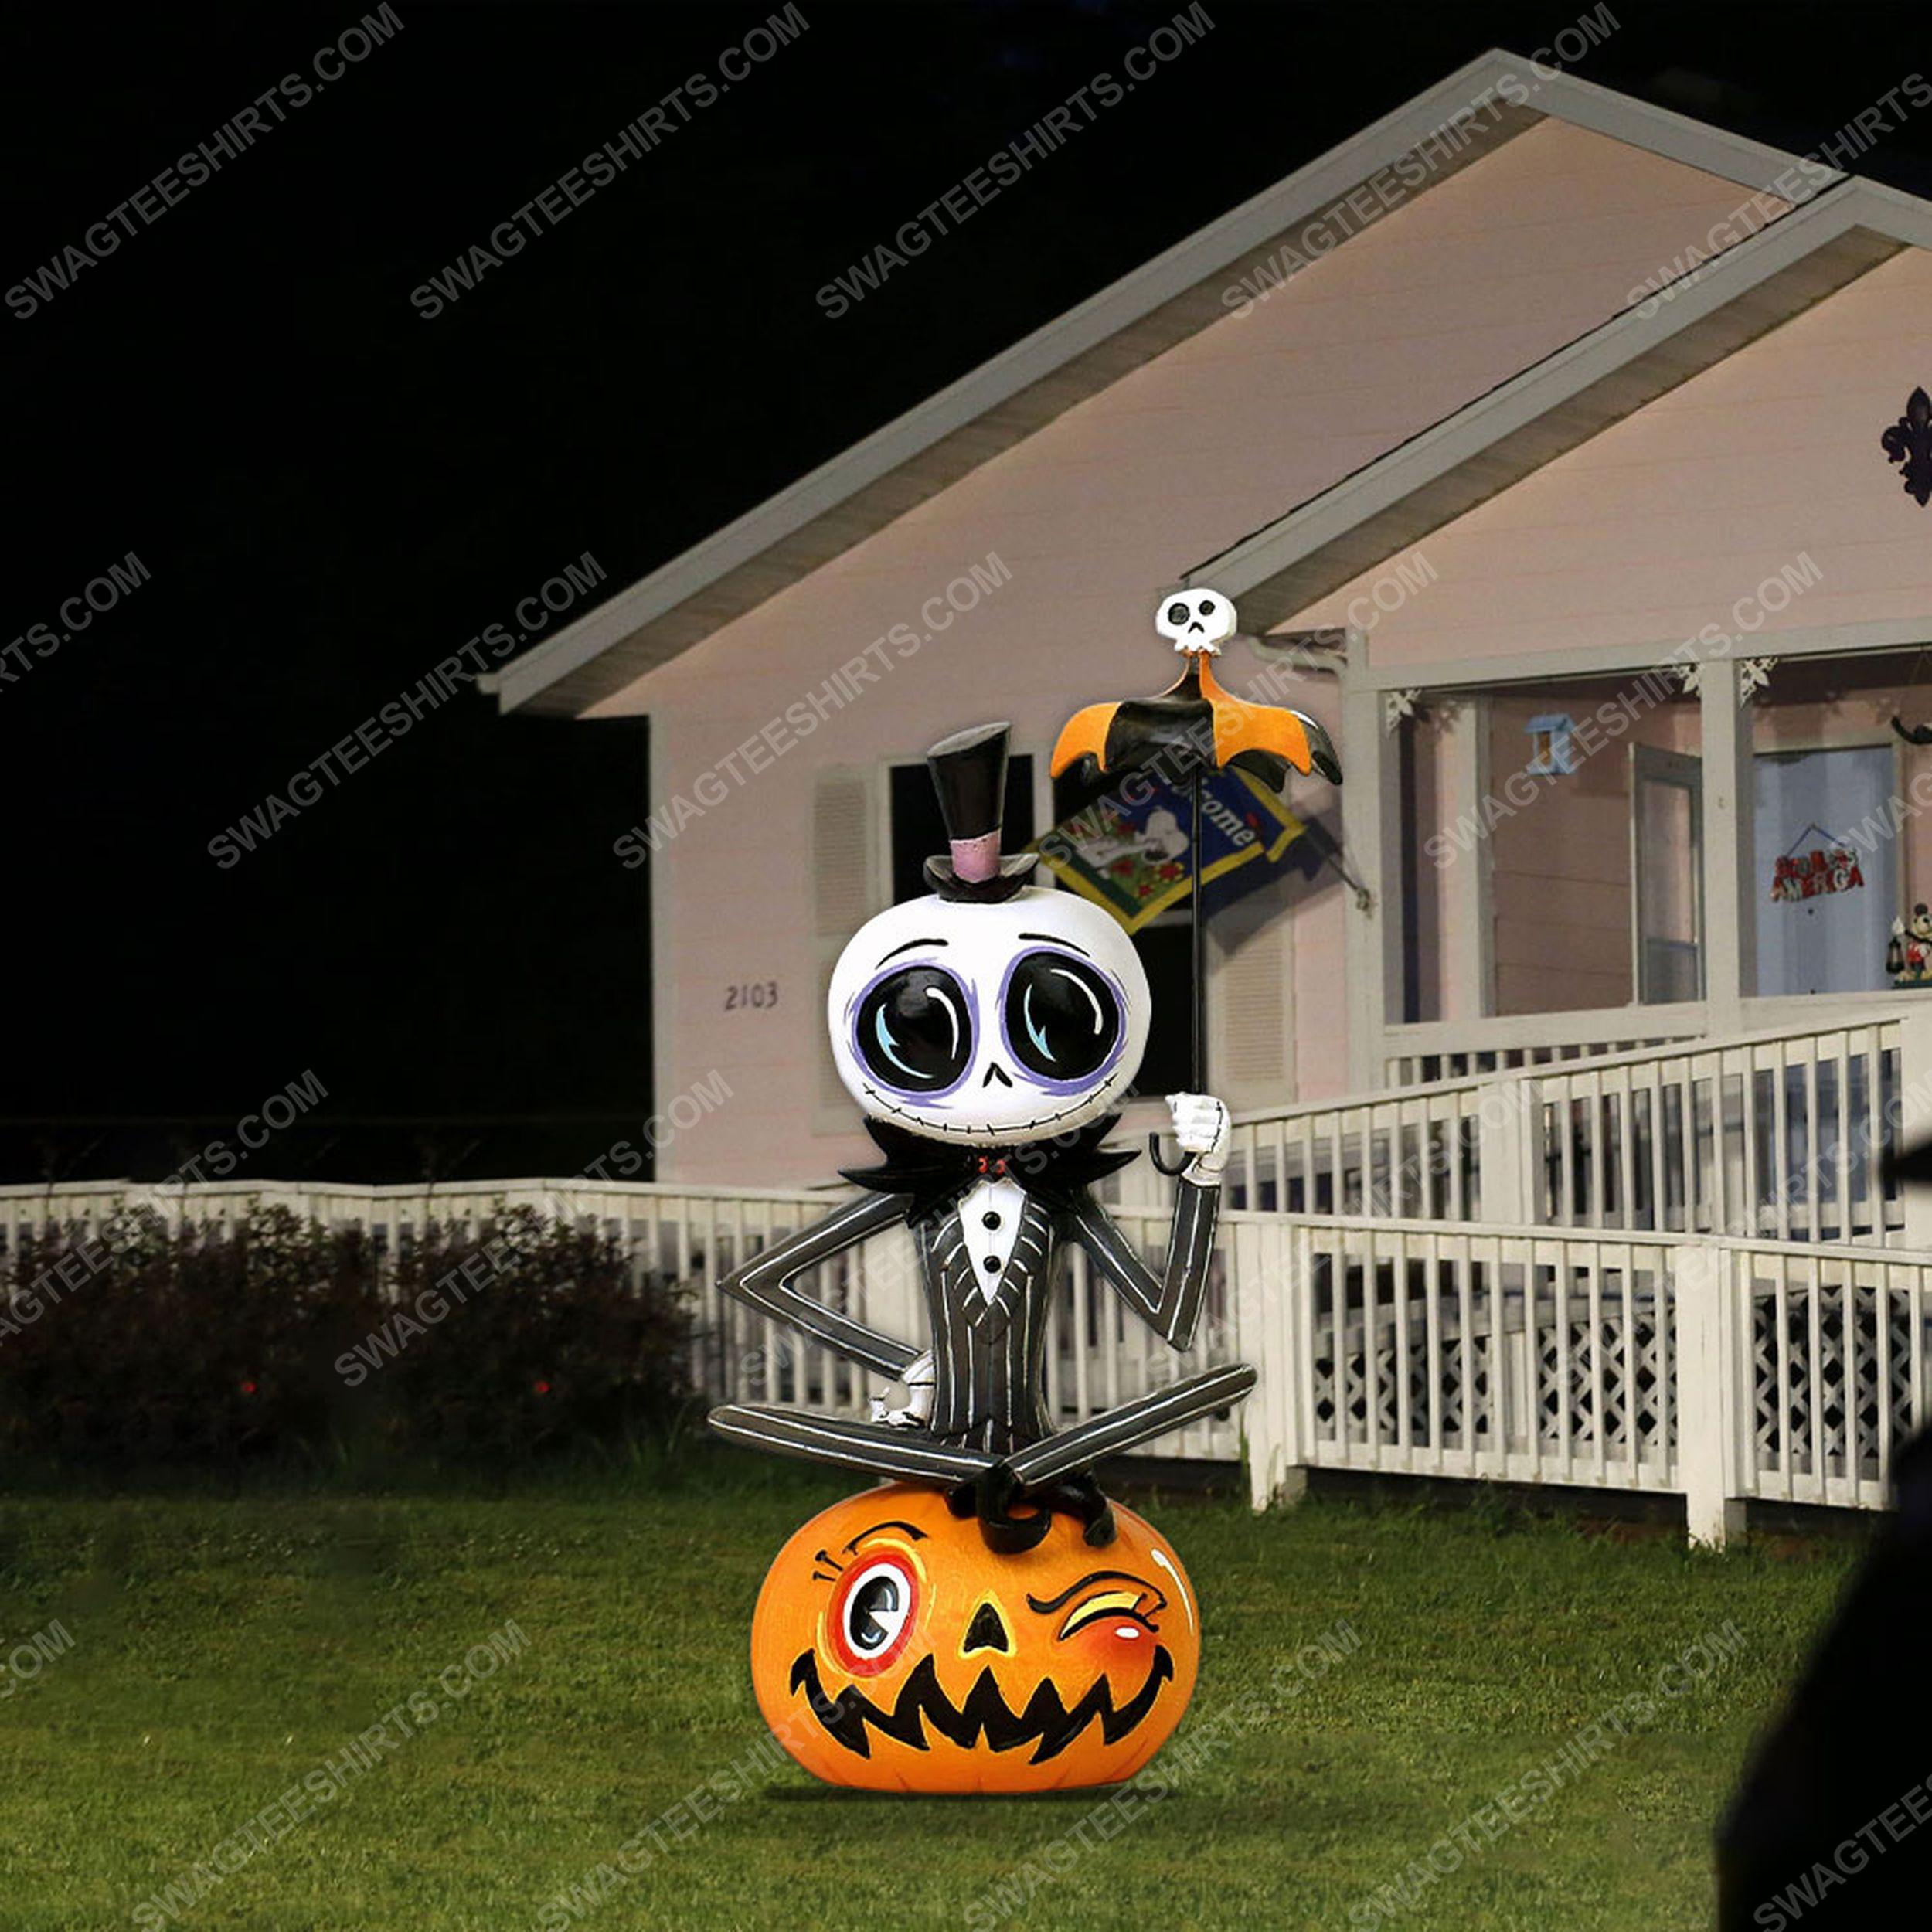 Jack skellington and pumpkin halloween yard sign 2(1)